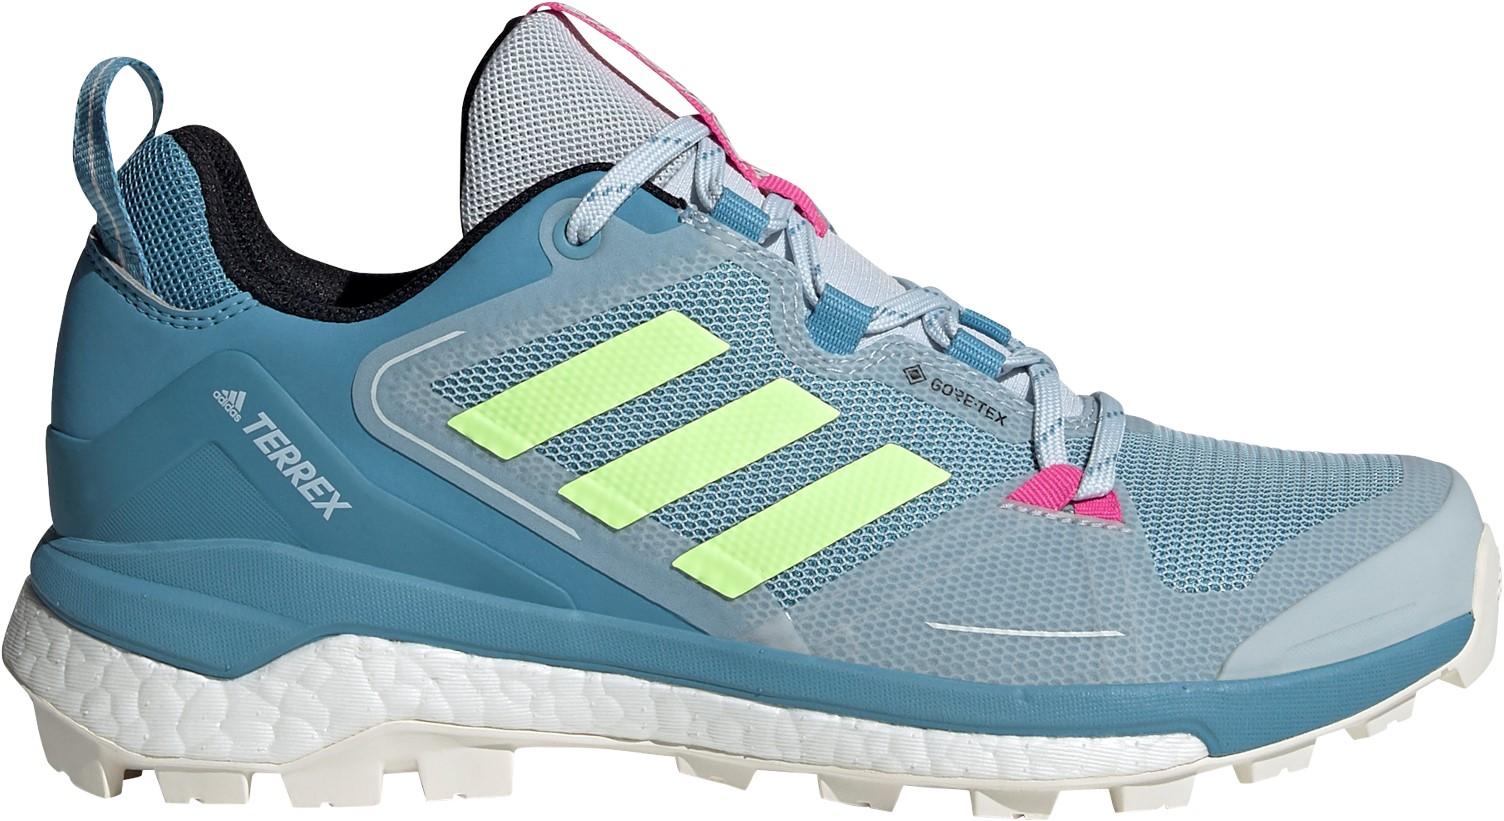 Adidas Terrex Skychaser 2 GTX W hazy blue/yellow/pink 39 1/3 (UK 6)